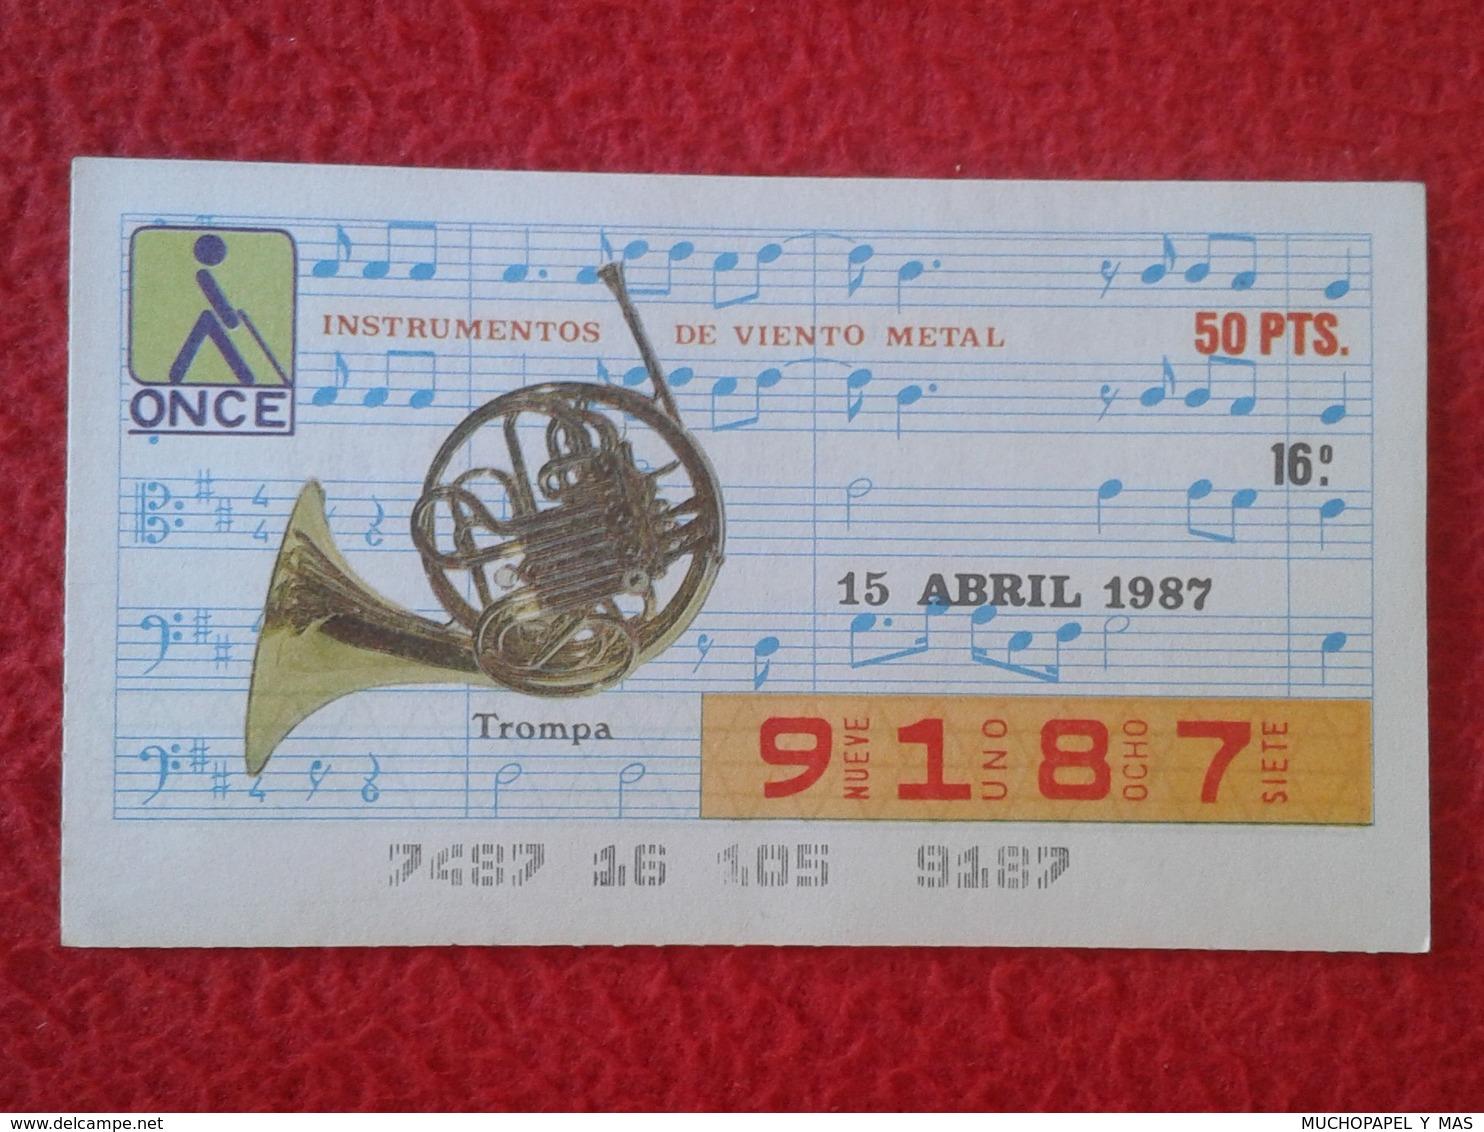 CUPÓN DE ONCE LOTTERY LOTERIE CIEGOS SPAIN LOTERÍA INSTRUMENT MUSIC MUSICAL INSTRUMENTS TROMPA VIENTO FRENCH HORN 1987 - Billetes De Lotería